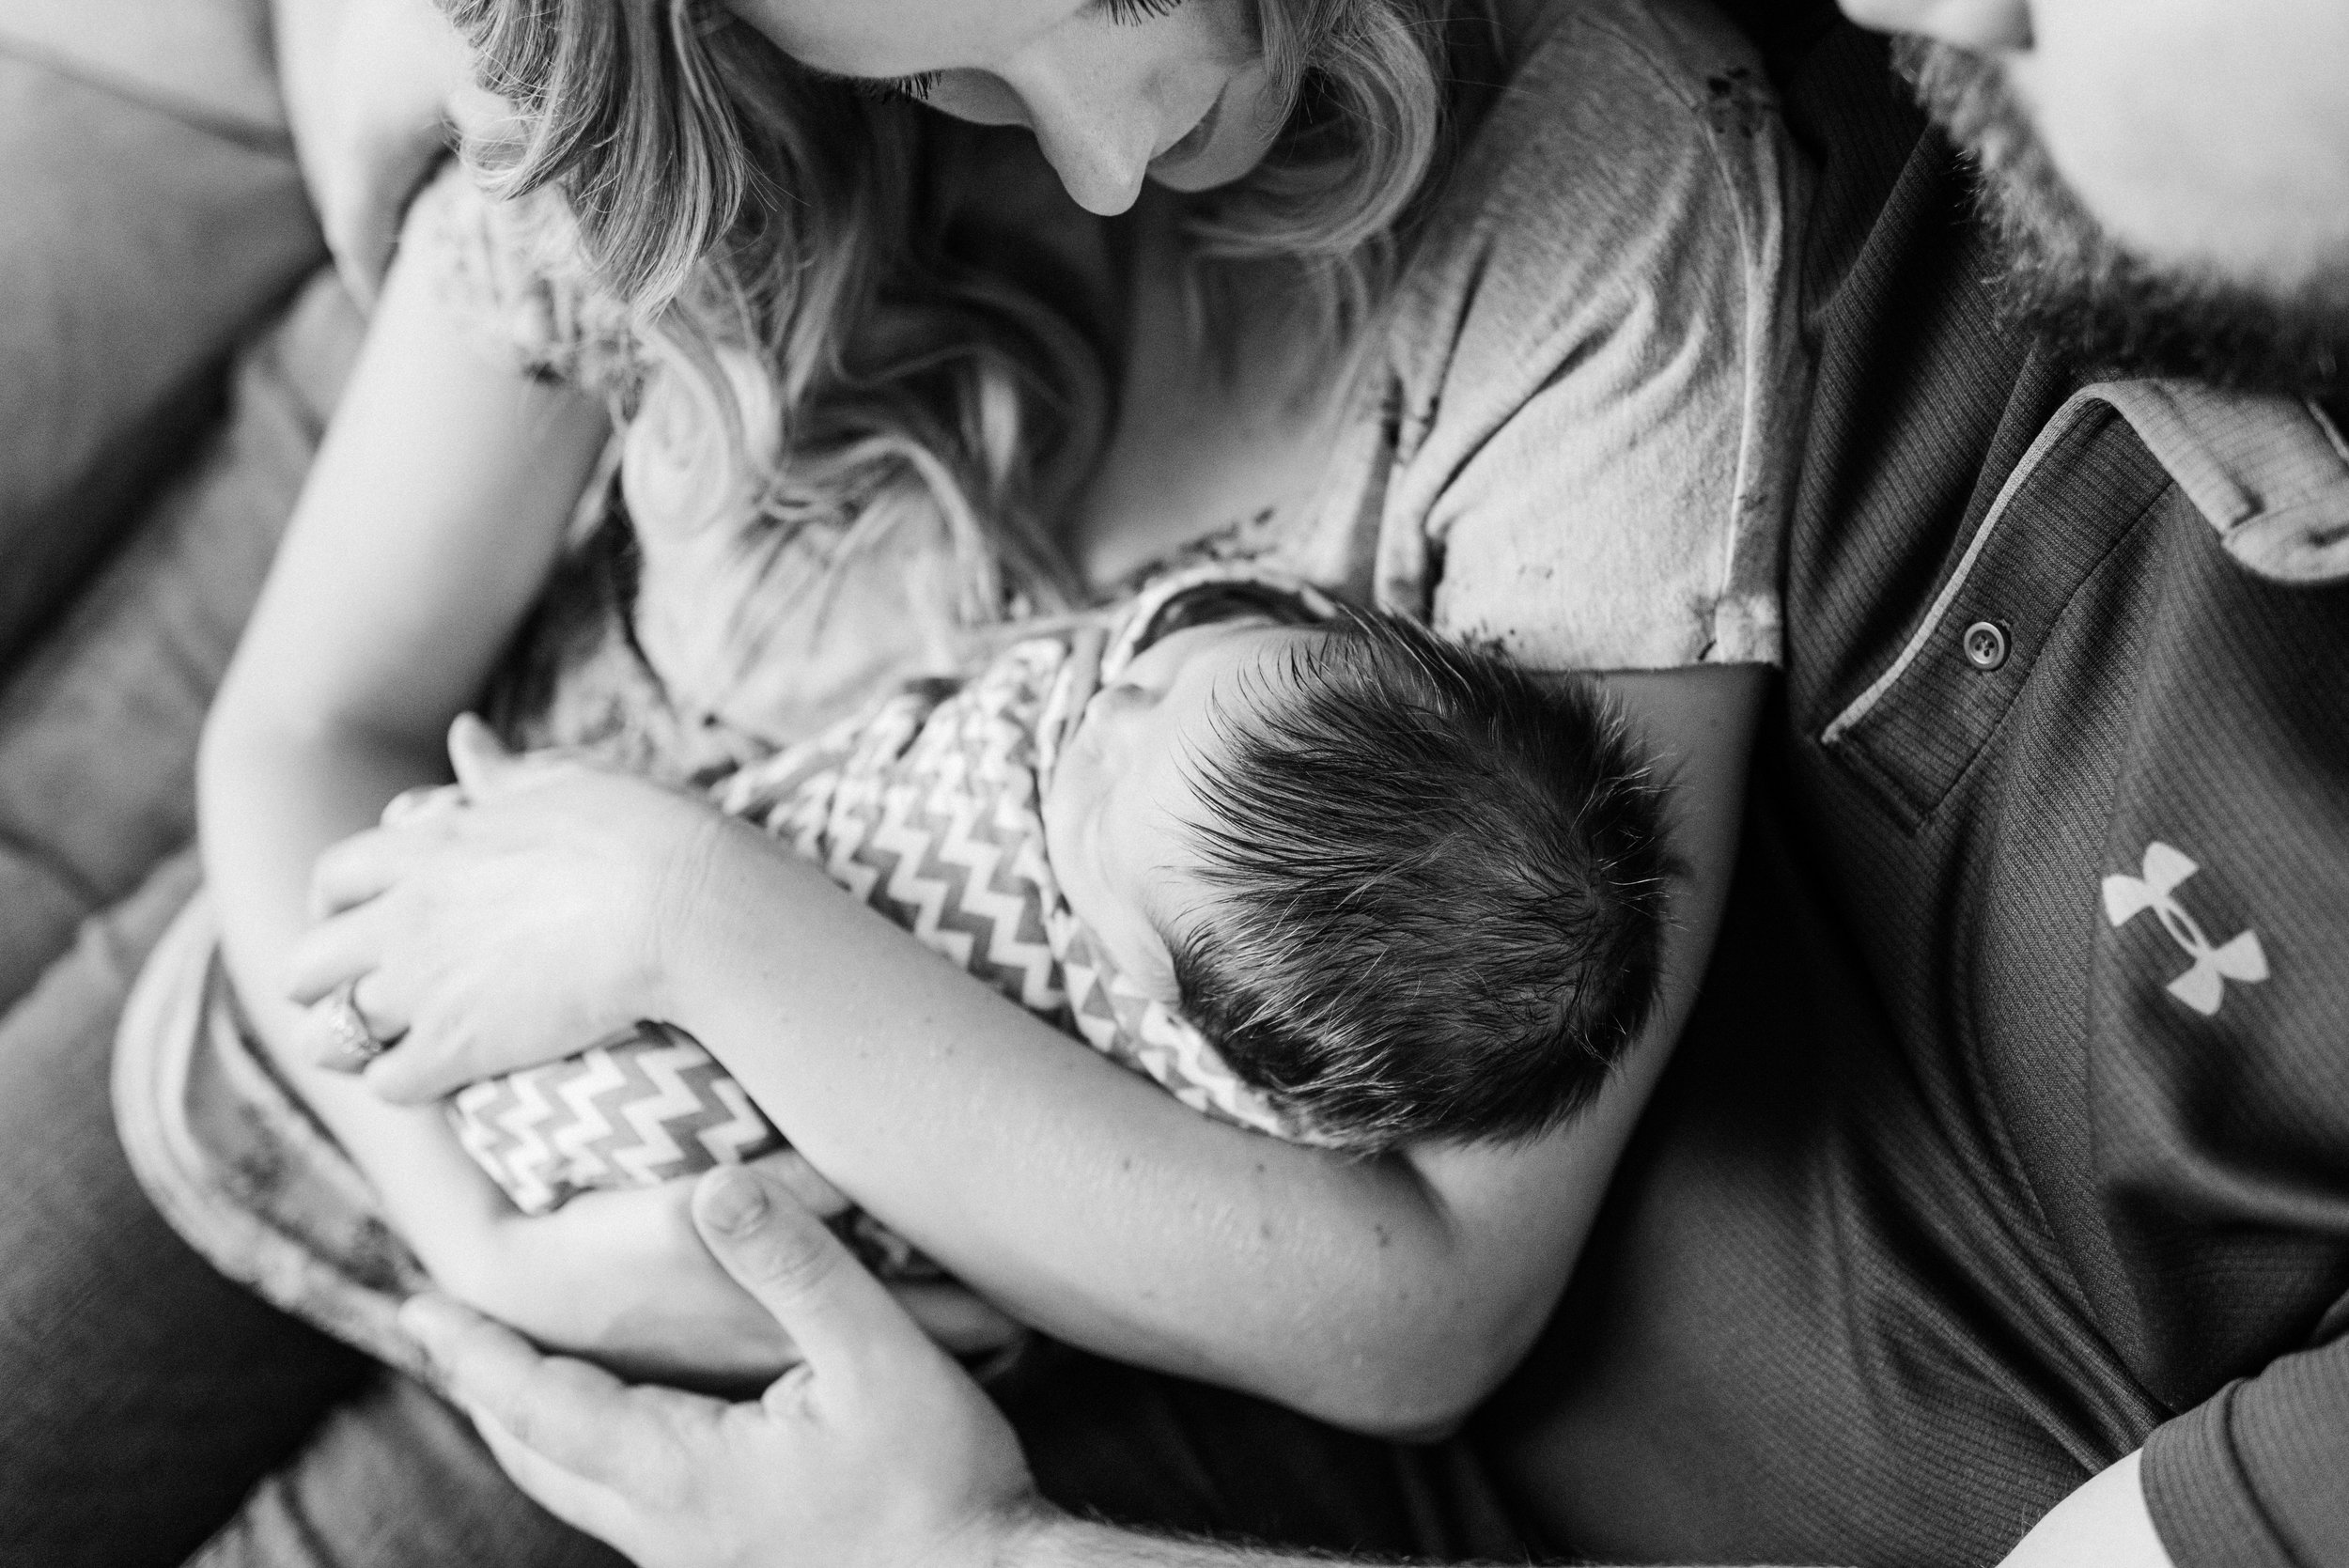 spokane-newborn-session-10.jpg